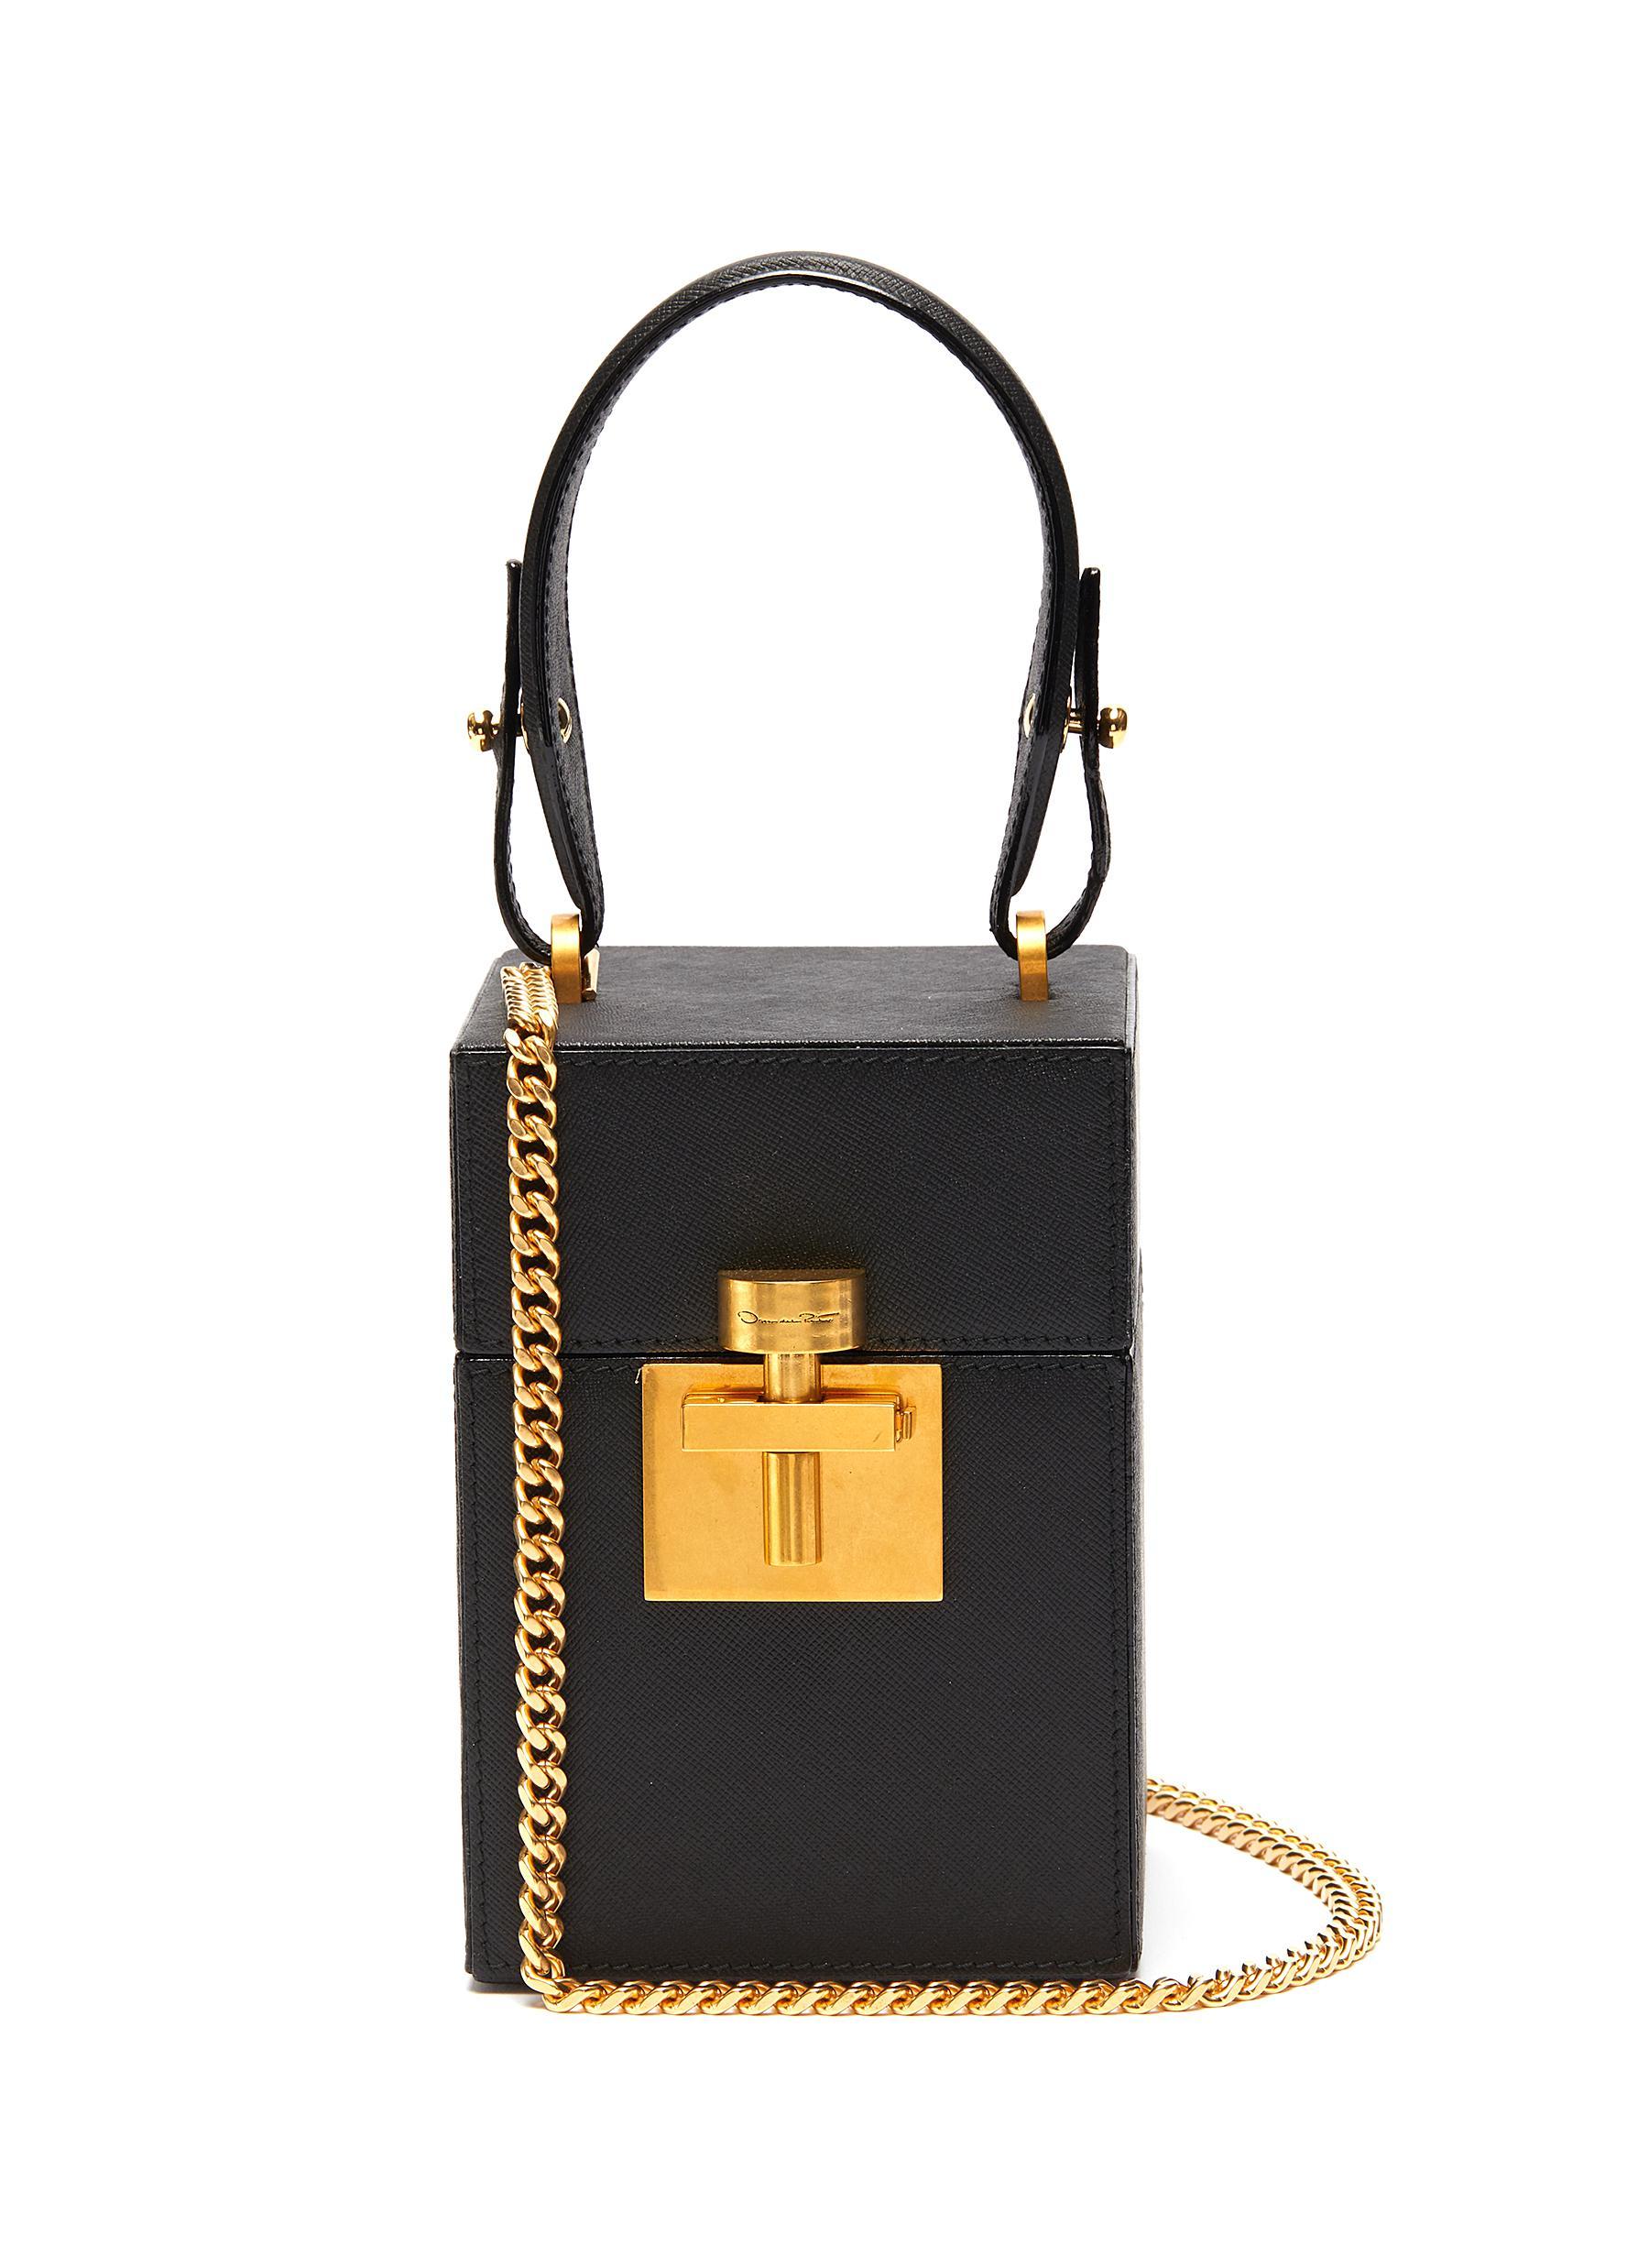 Oscar De La Renta Bags 'Alibi' mini leather box bag